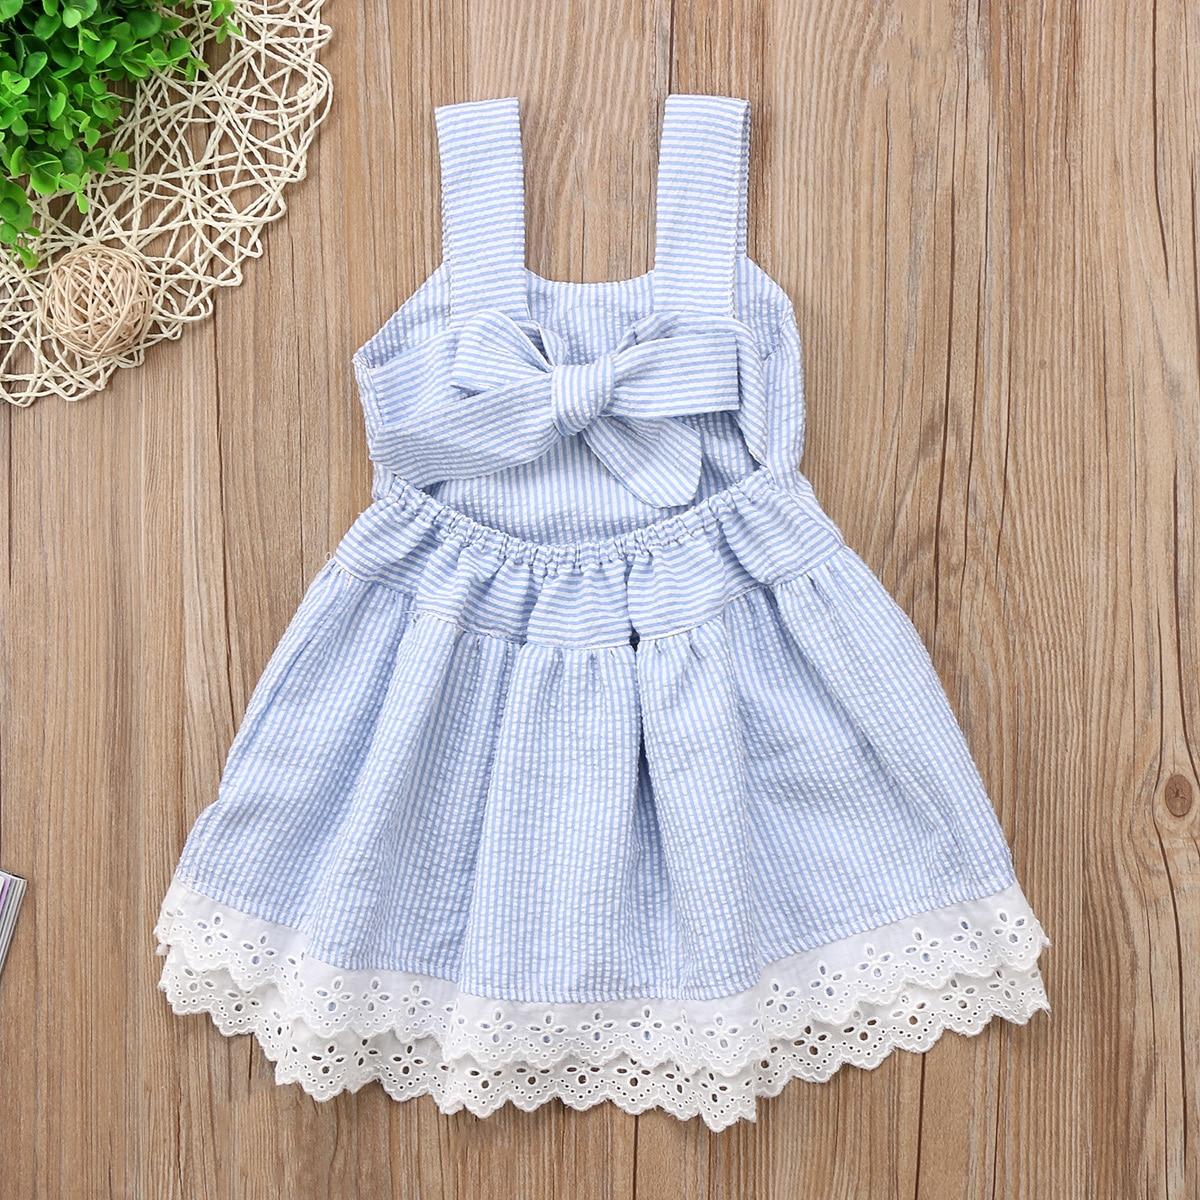 Summer Kids Baby Girls Princess Party Dress A-Line Sleeveless Tutu Striped Backless Bowknot Dresses Vestiods 1-5T